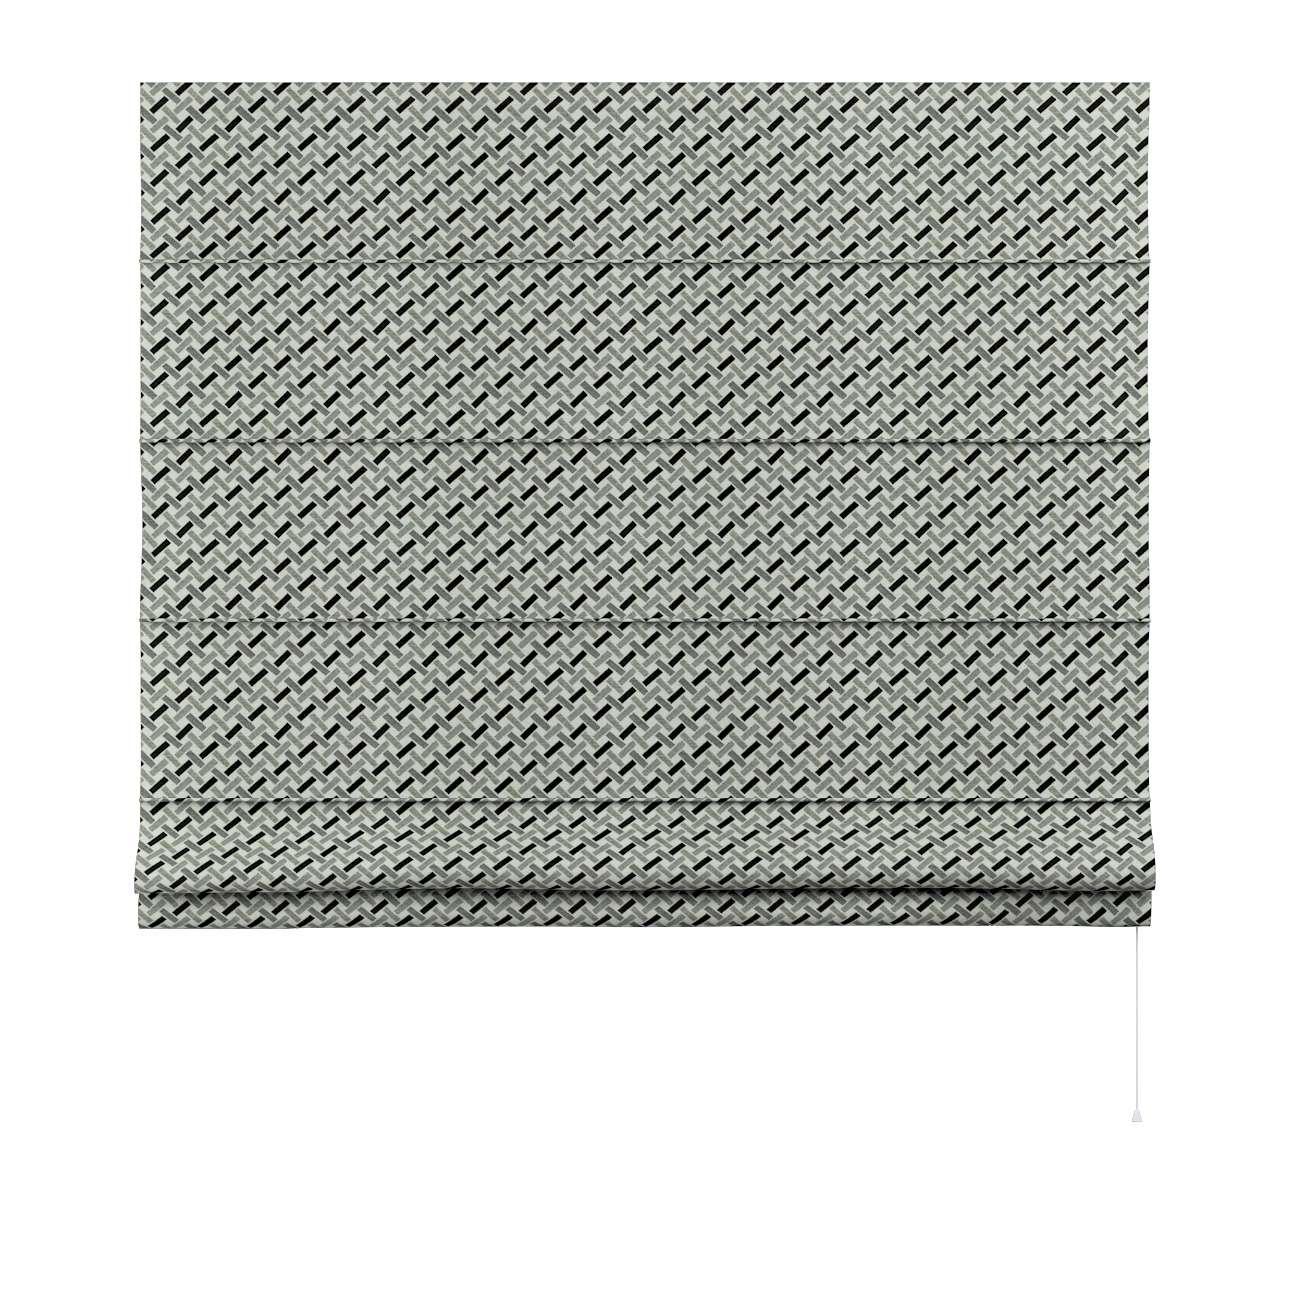 Rímska roleta Capri V kolekcii Black & White, tkanina: 142-78